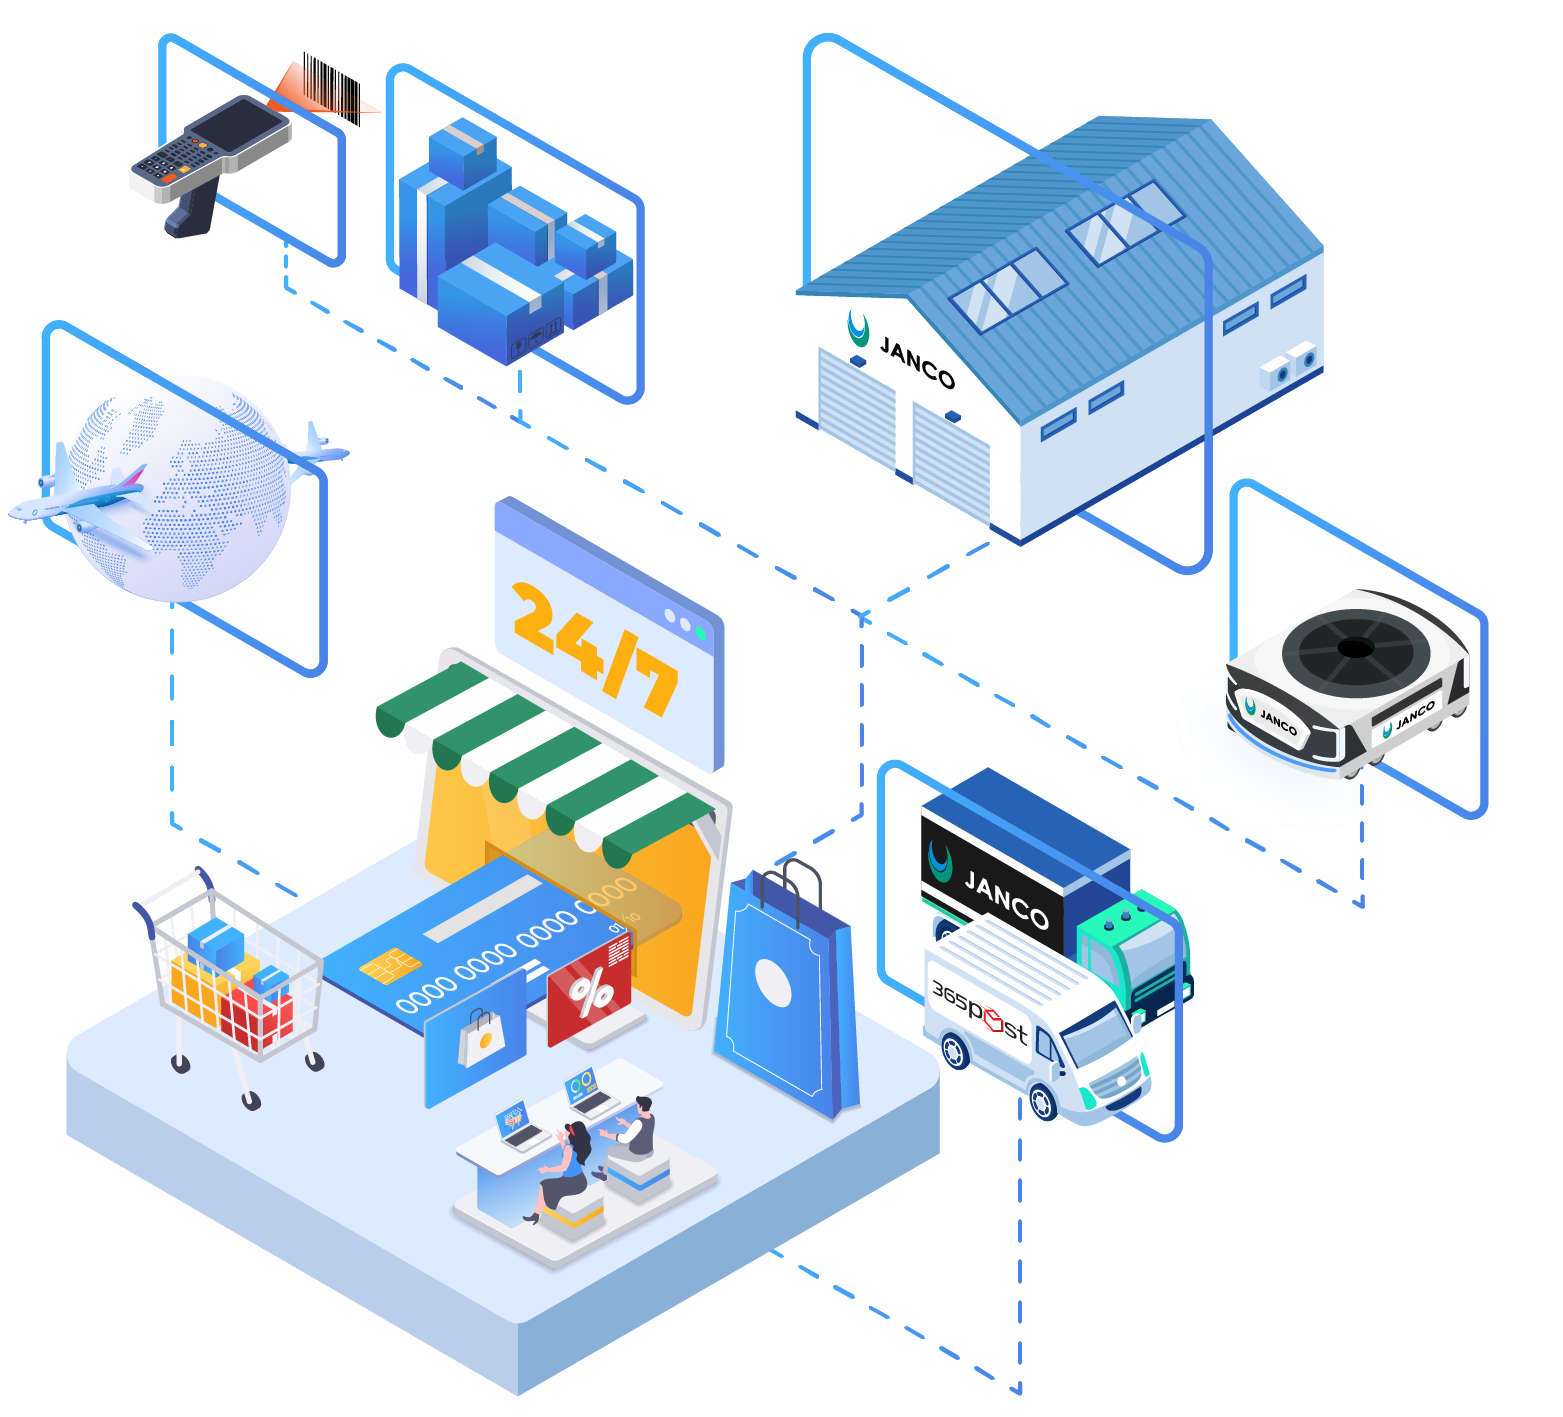 JANCO E-commerce fulfilment workflow